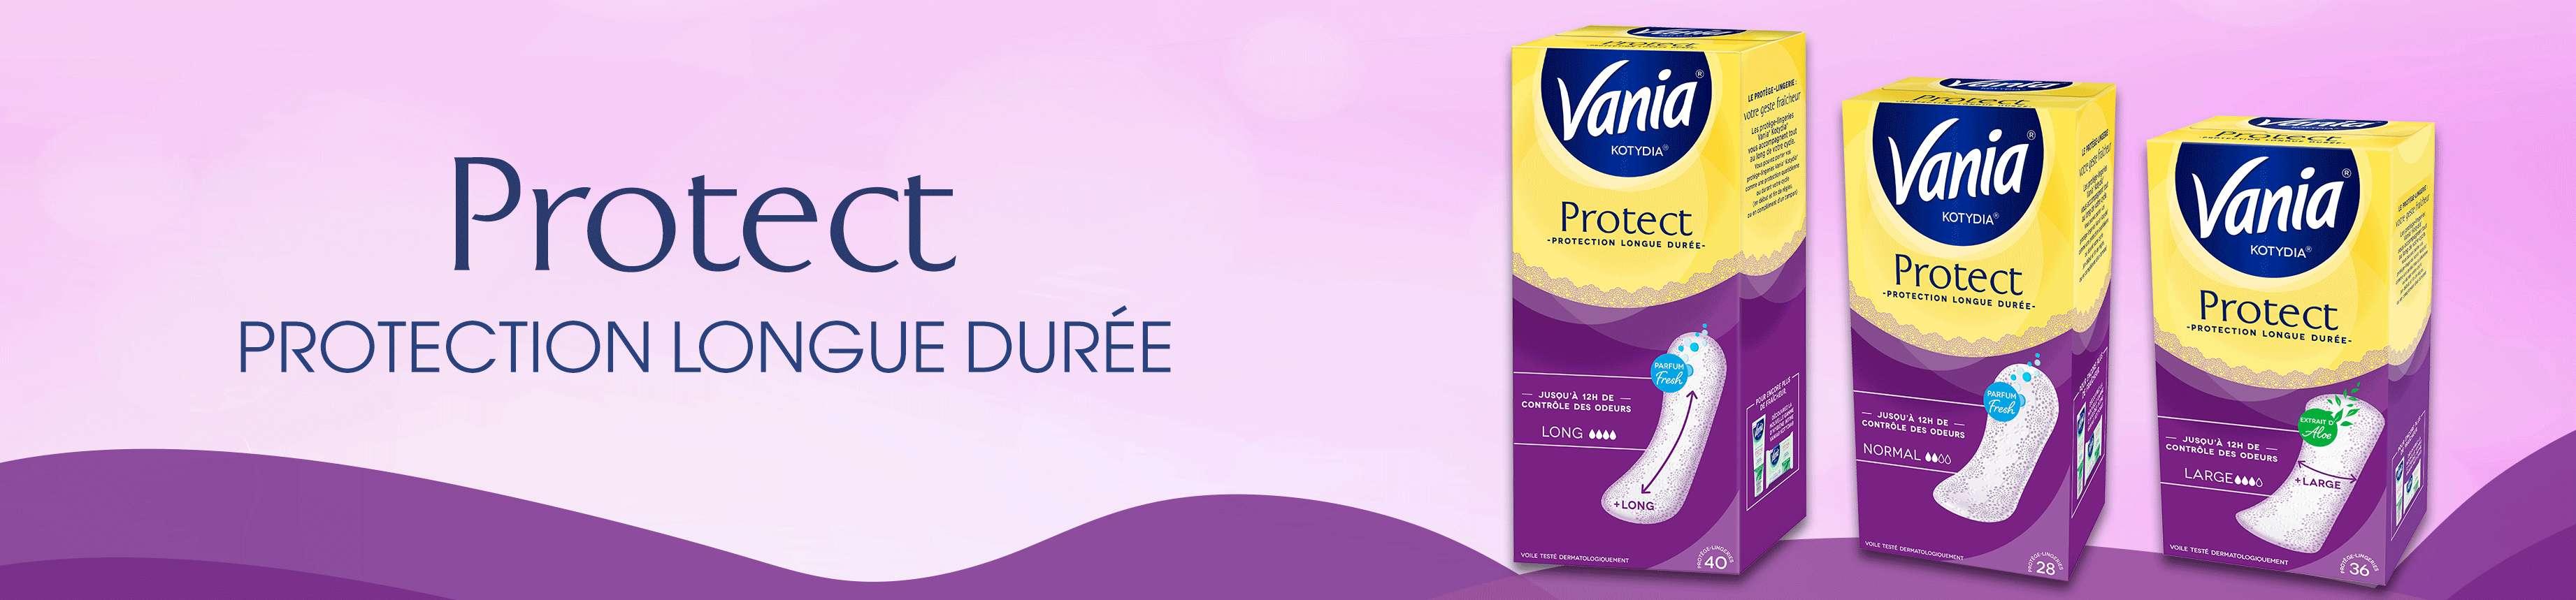 protege-slip-protect-vania